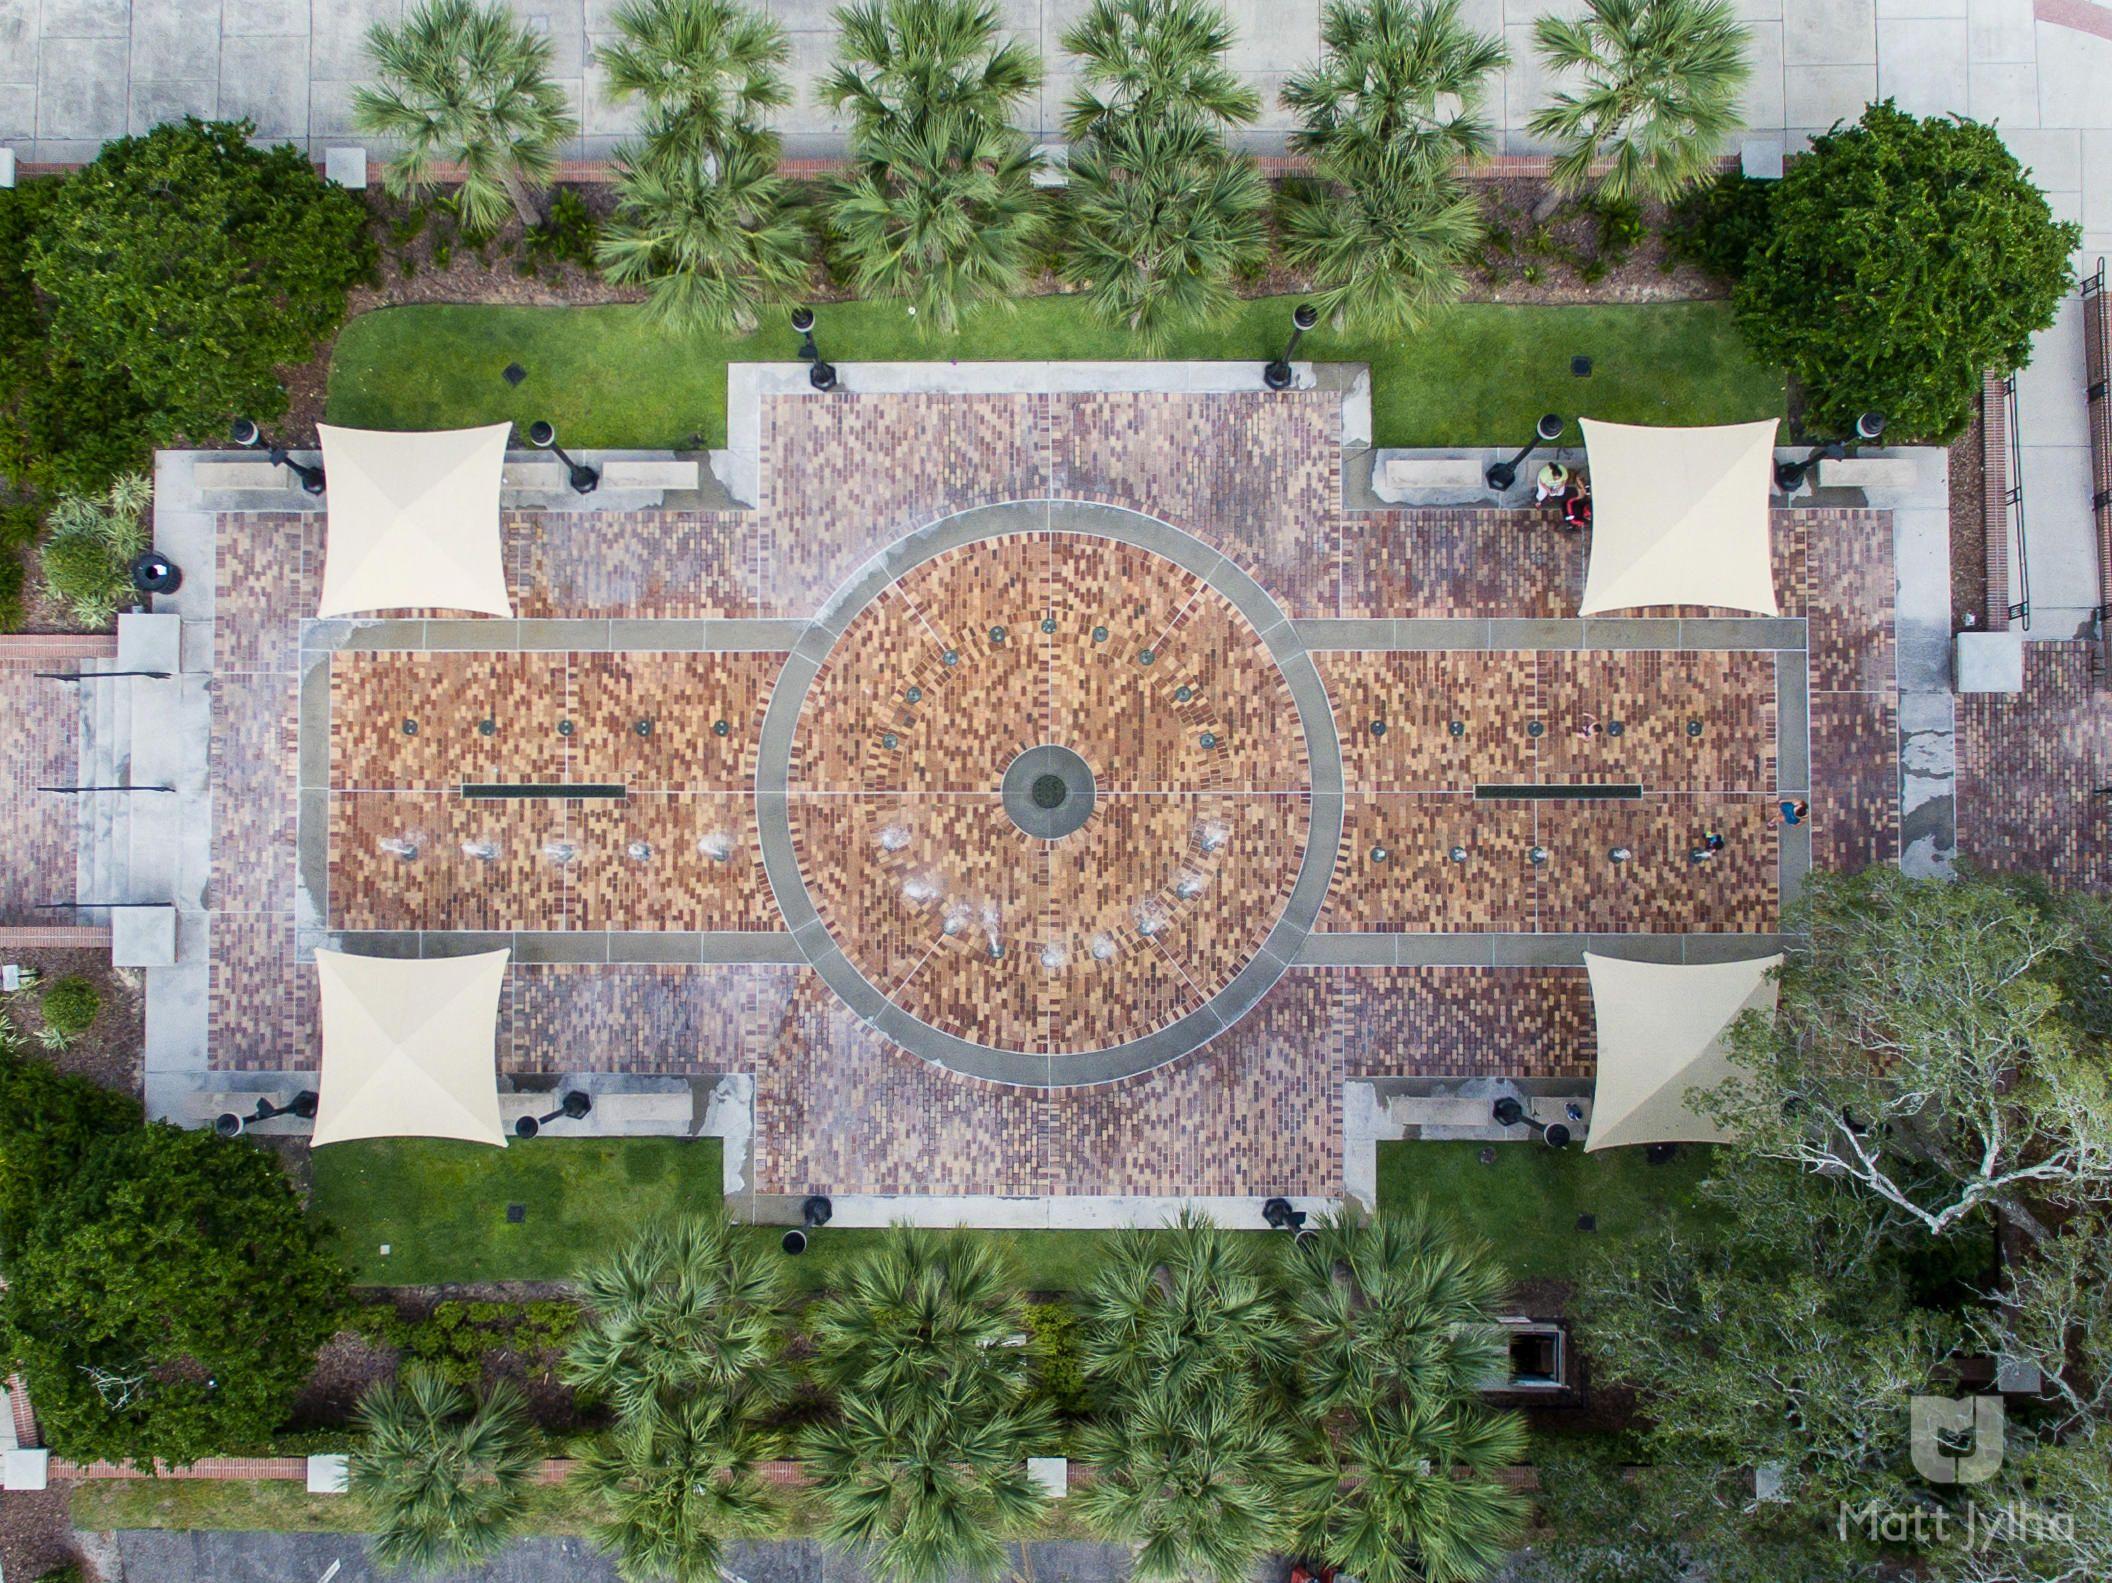 downtown winter garden florida splash pad from 144 feet aerial